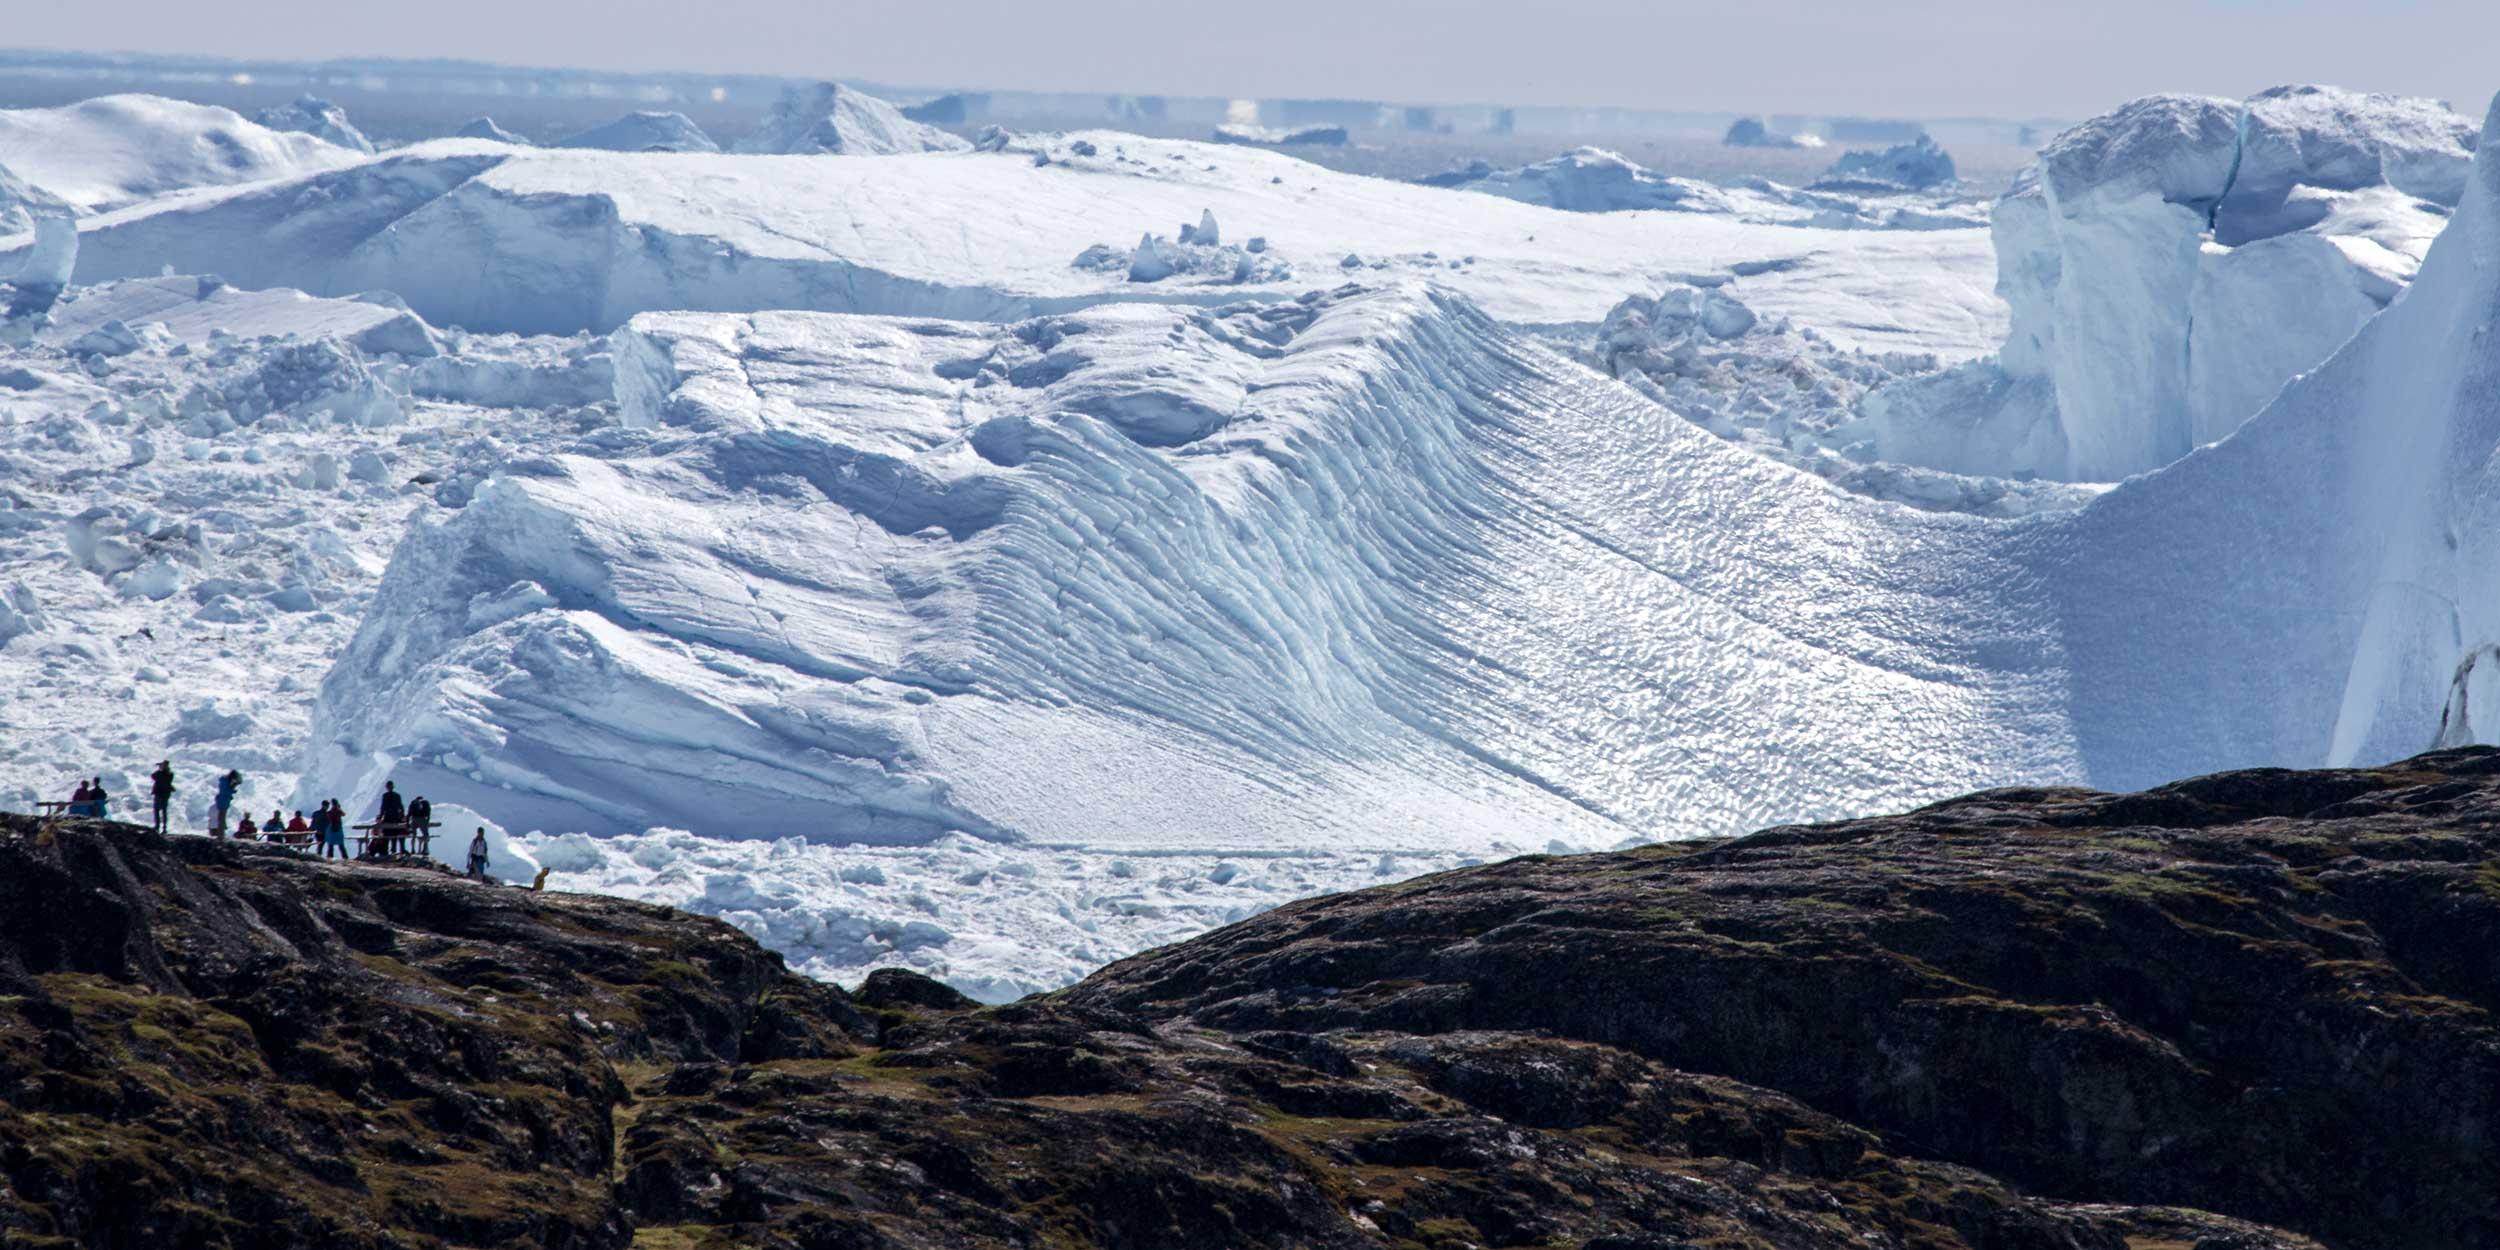 Ilulissat-Greenland-0708-Canon-EOS-6D-MG-3287.